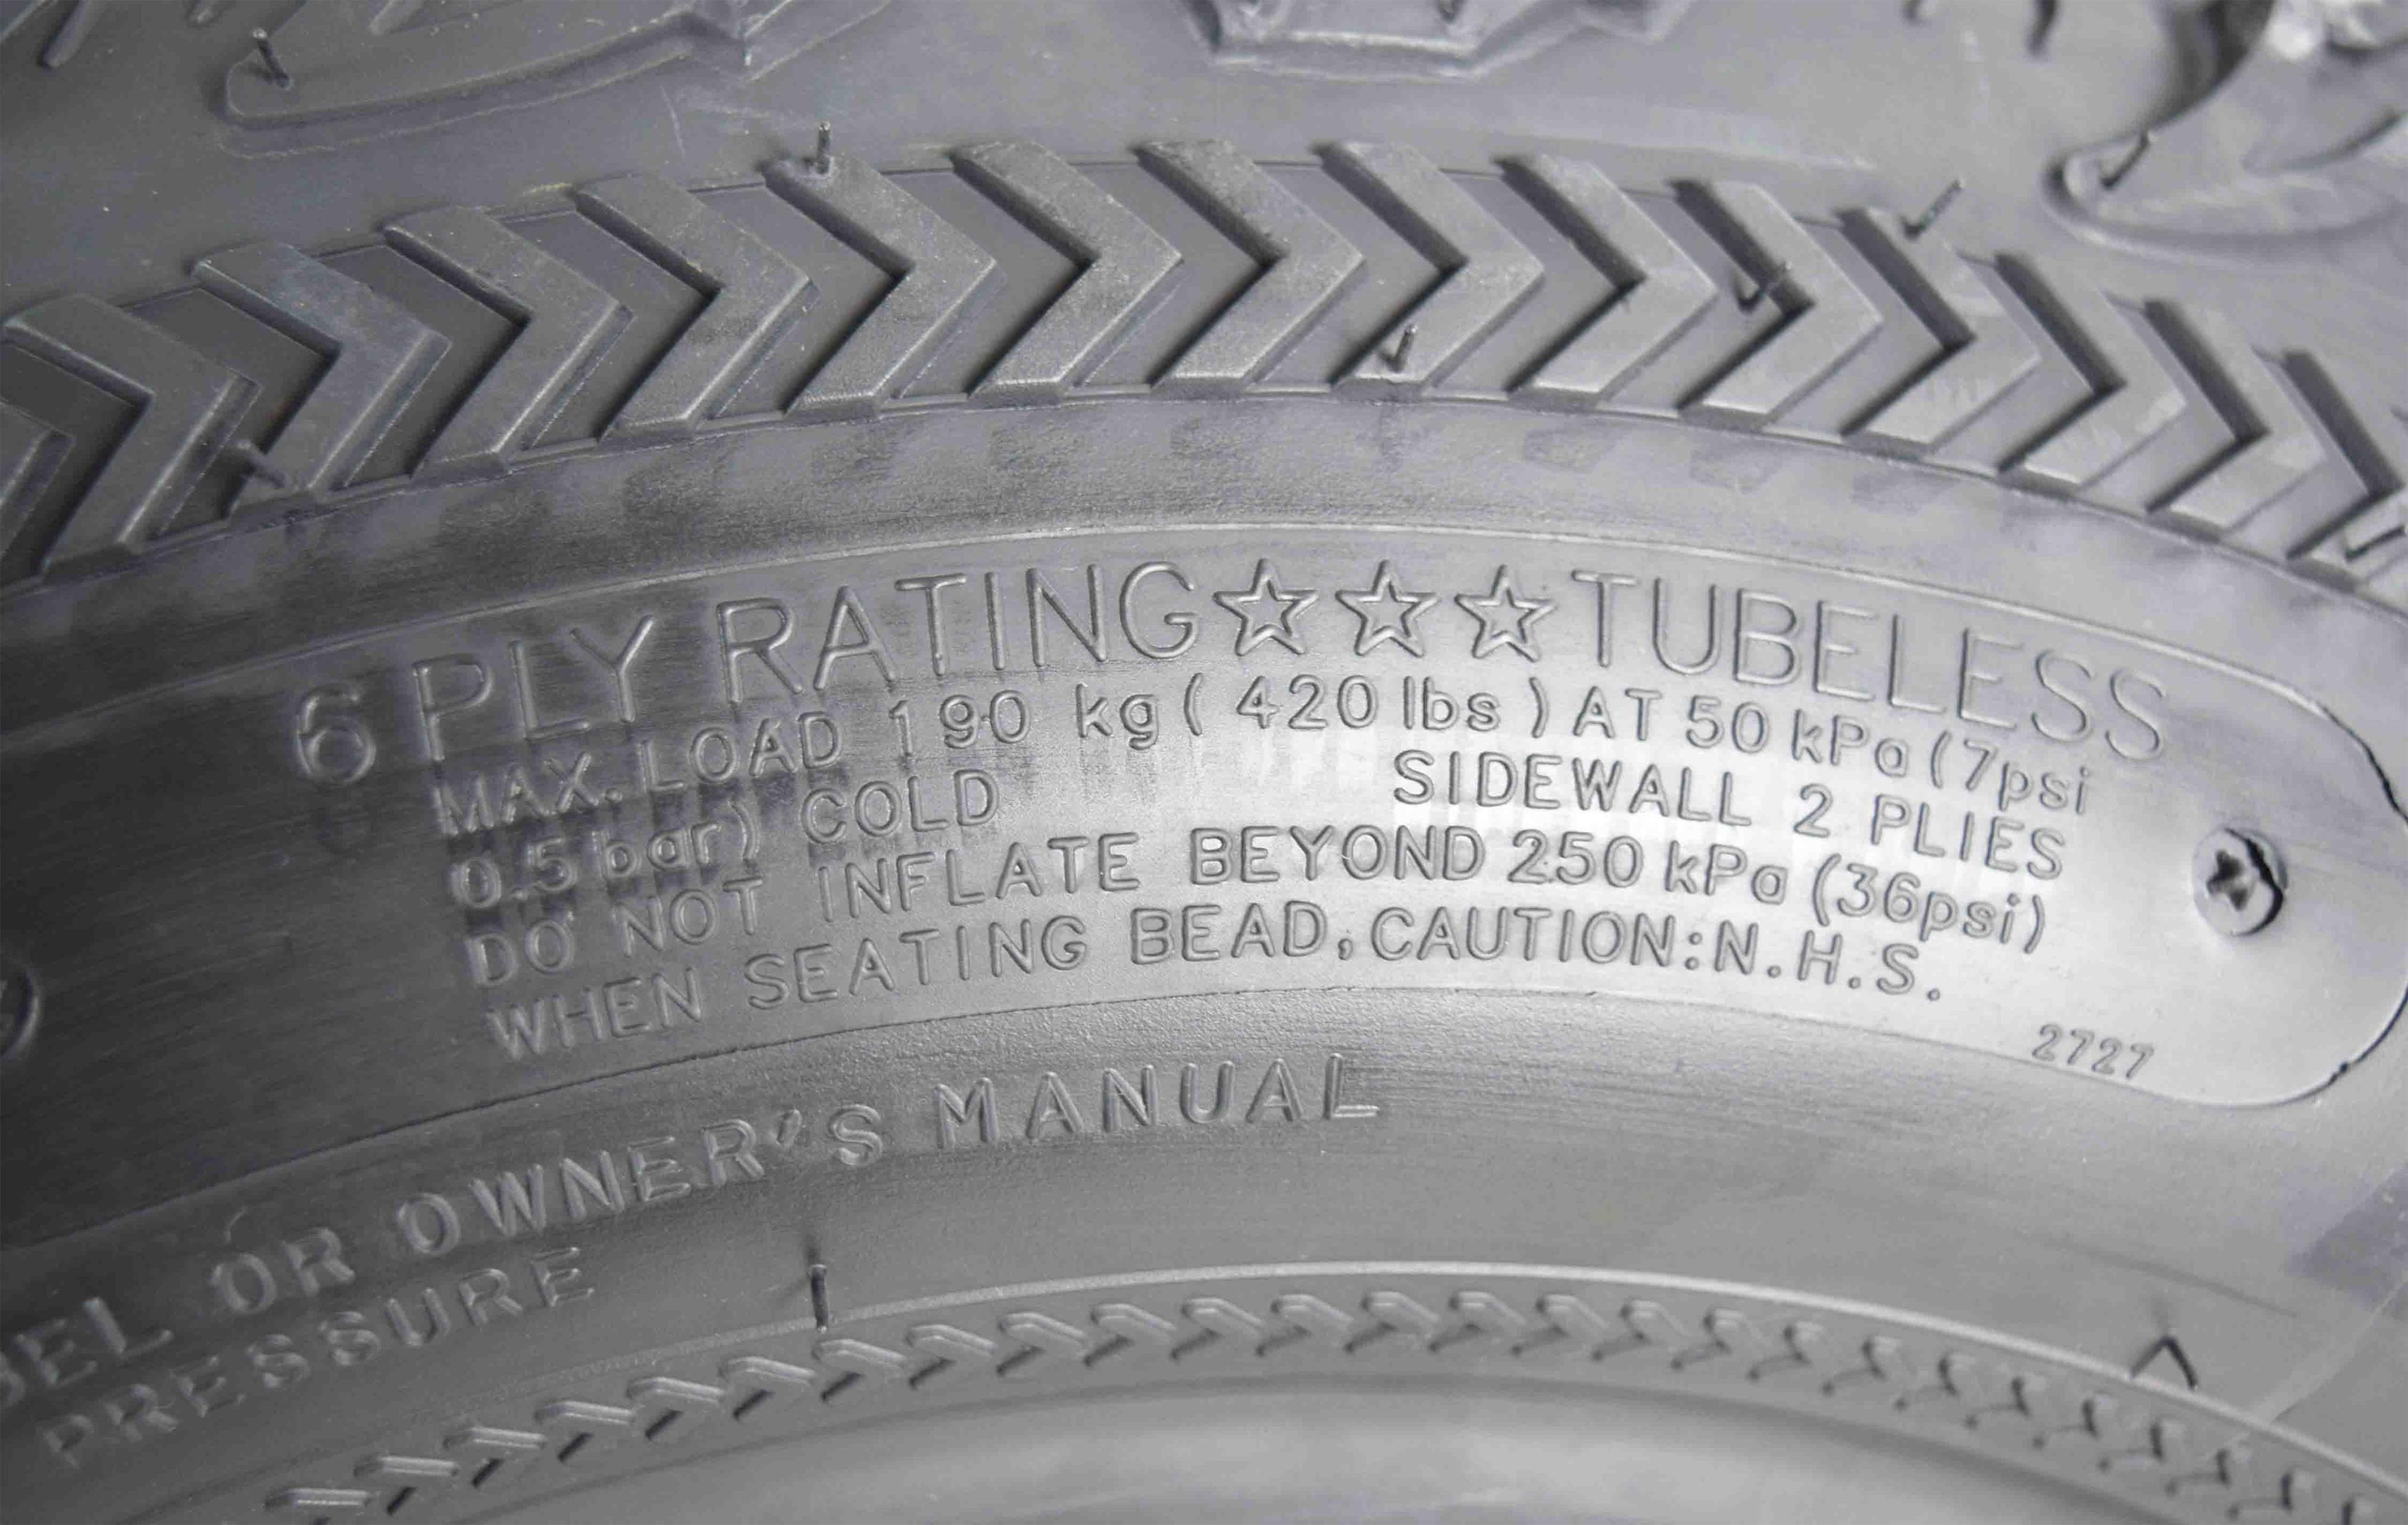 Kenda-Bear-Claw-EX-25x10-12-Rear-ATV-6-PLY-Tire-Bearclaw-25x10x12-Single-Tire-image-5